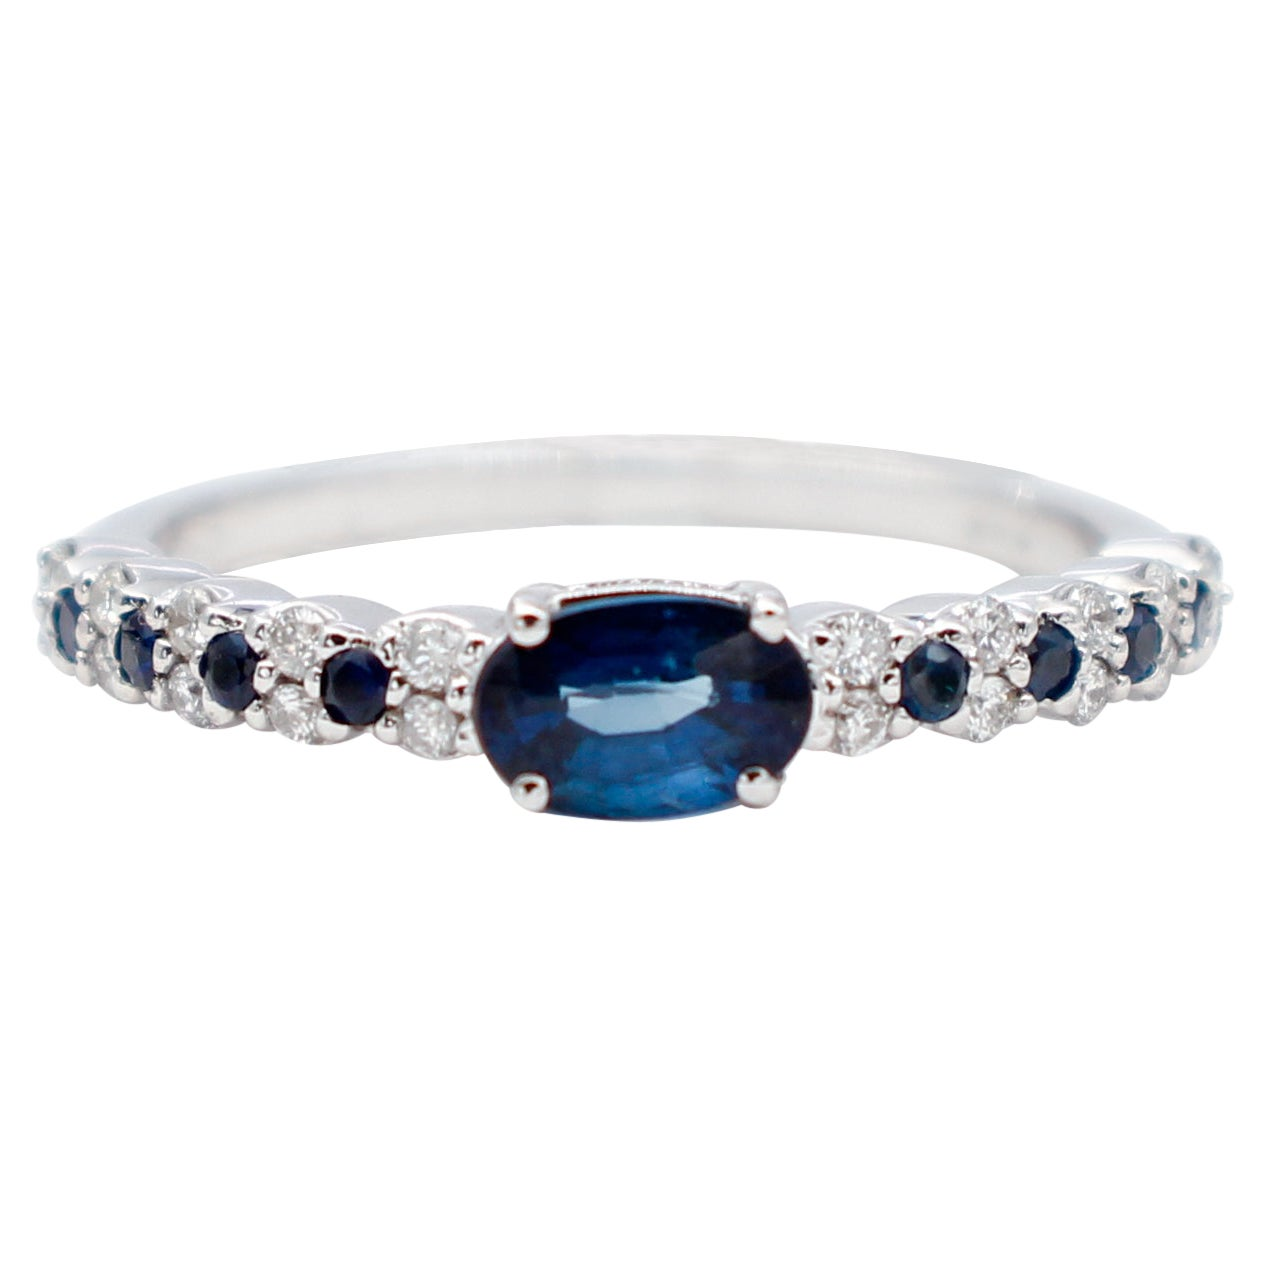 Blue Sapphires, Diamonds, 18 Karat White Gold Modern Ring